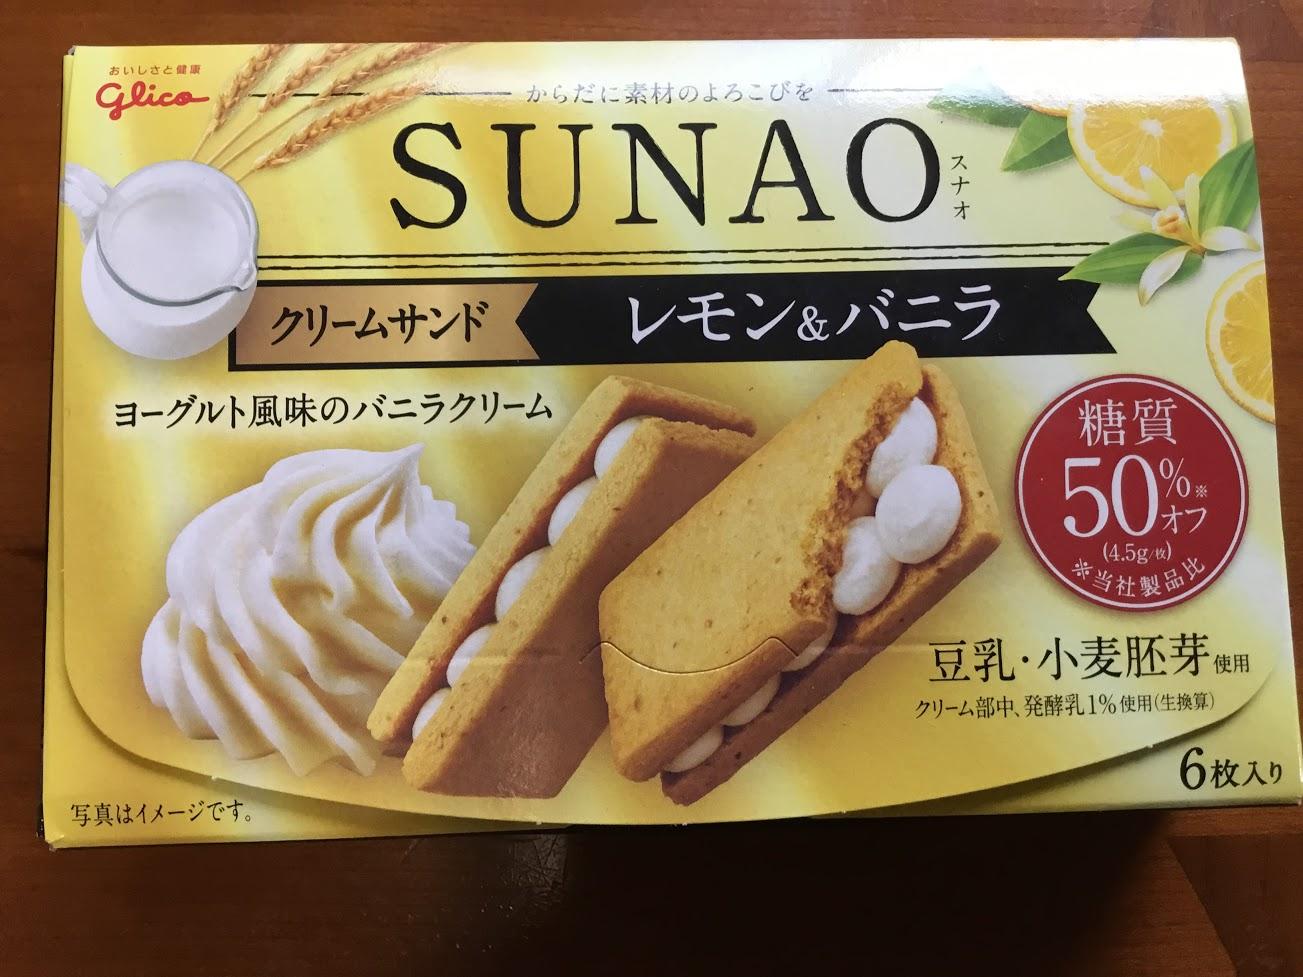 SUNAOクリームサンド レモン&バニラの箱